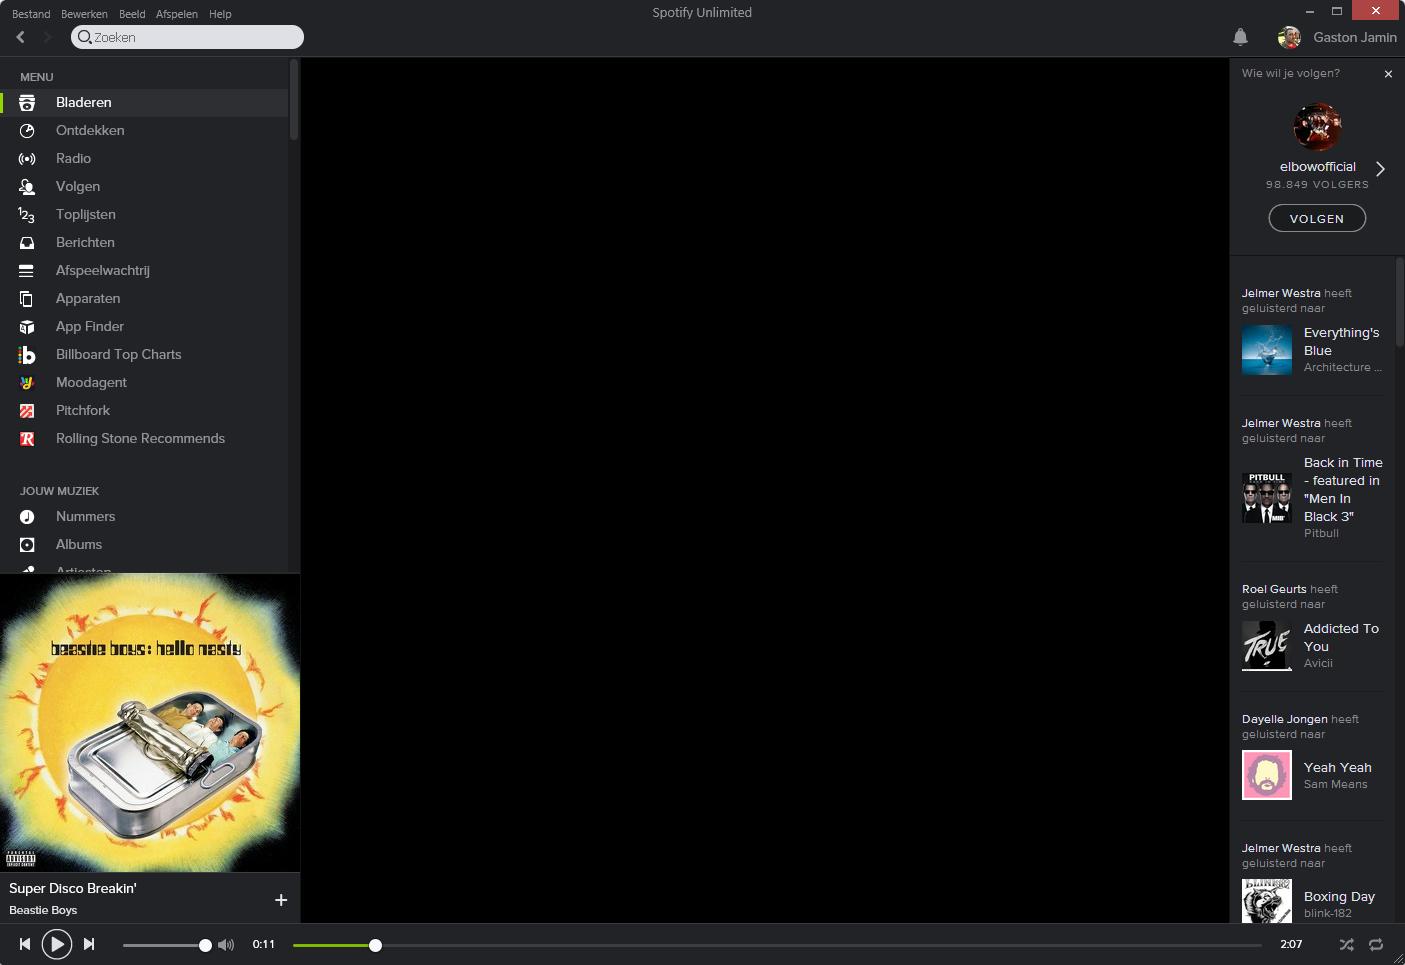 Screenshot 2014-04-11 21.31.35.png